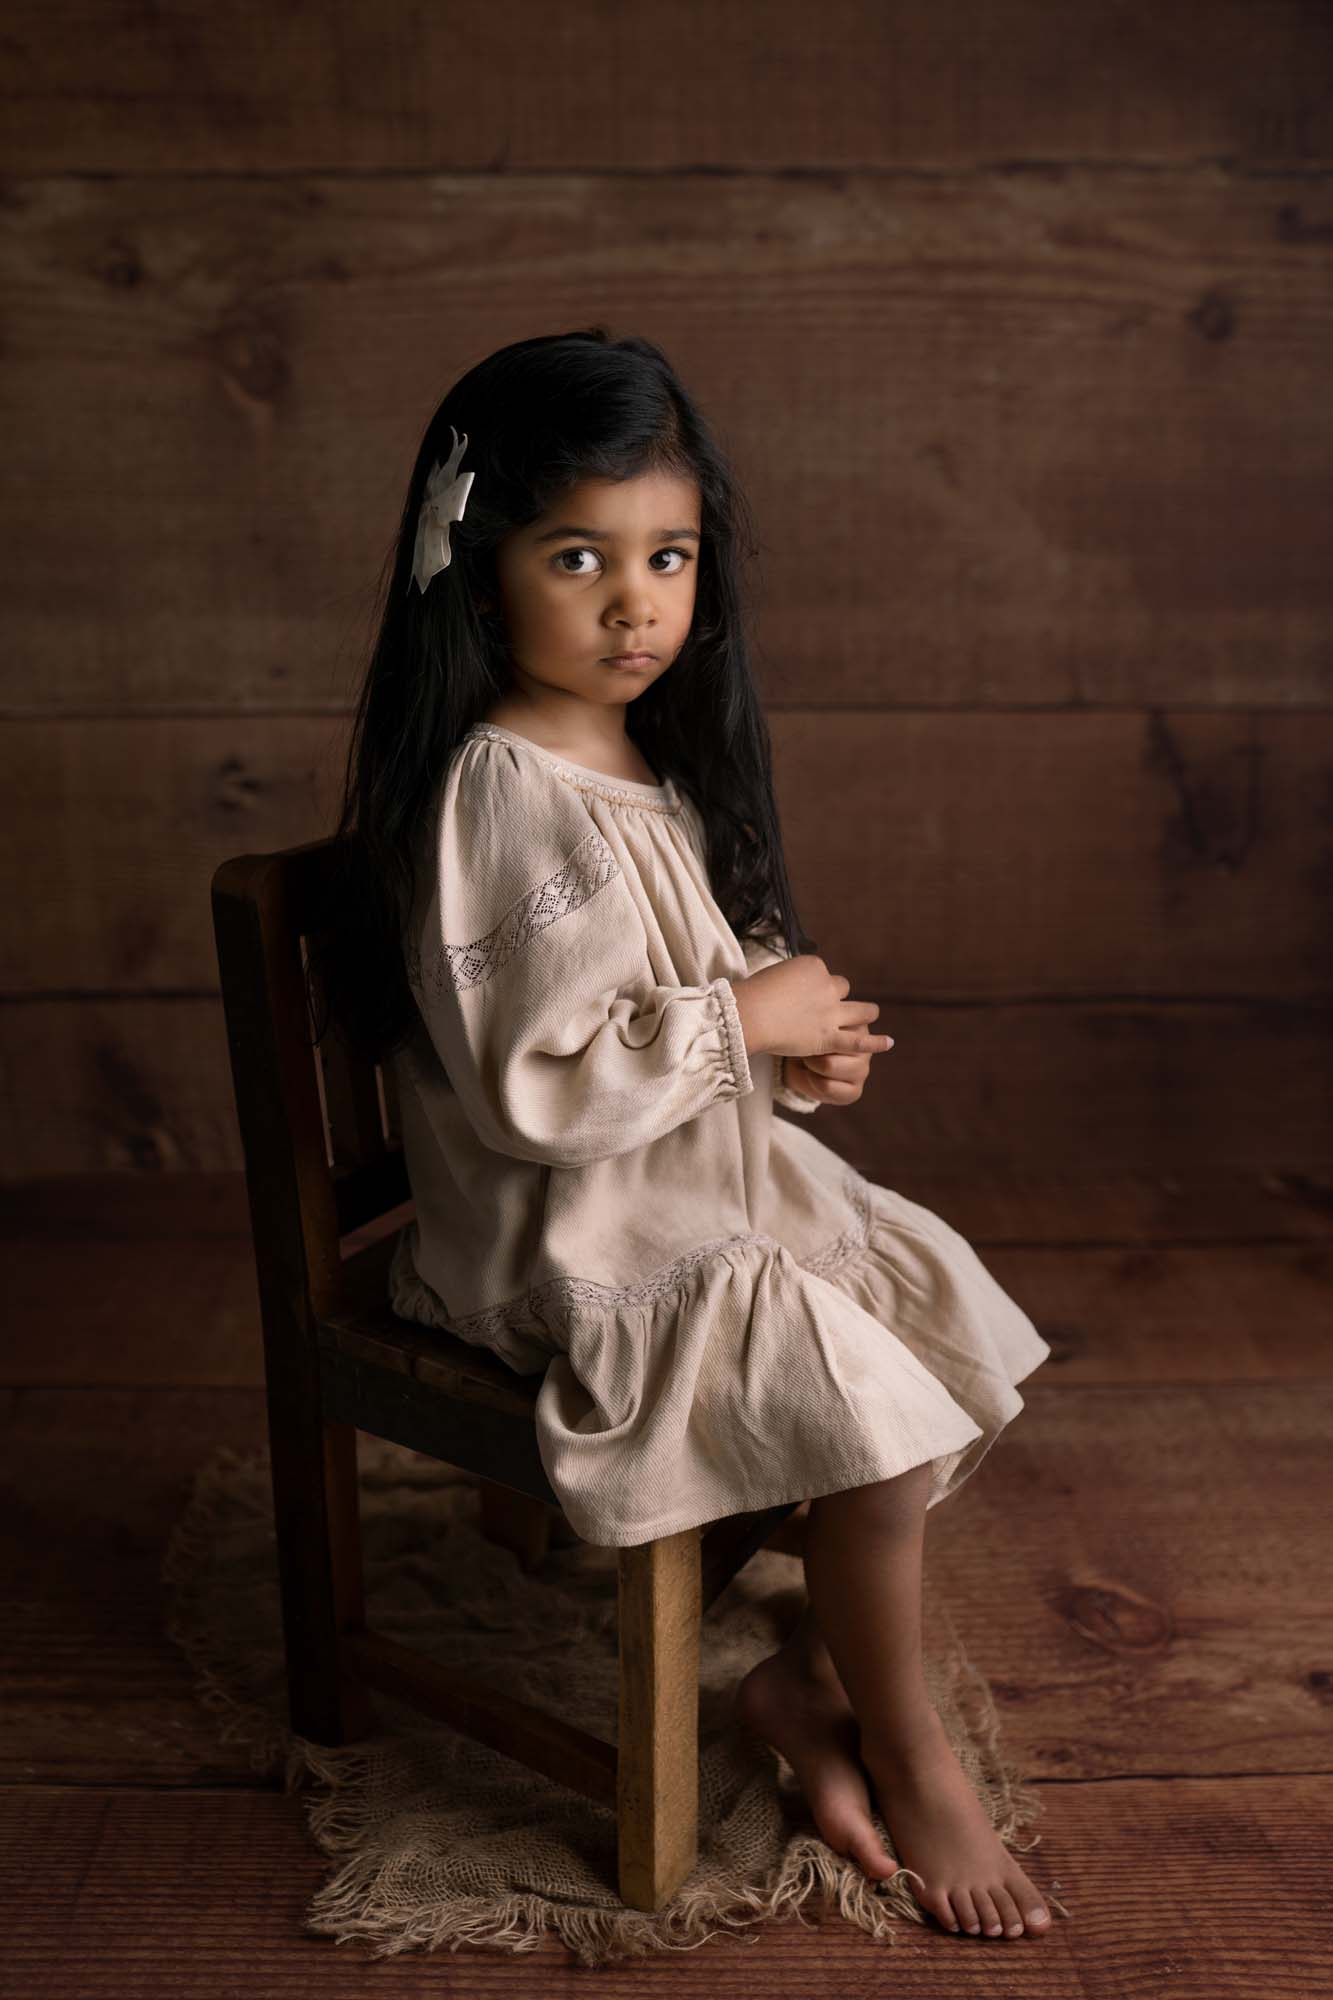 Childrens Photographer essex